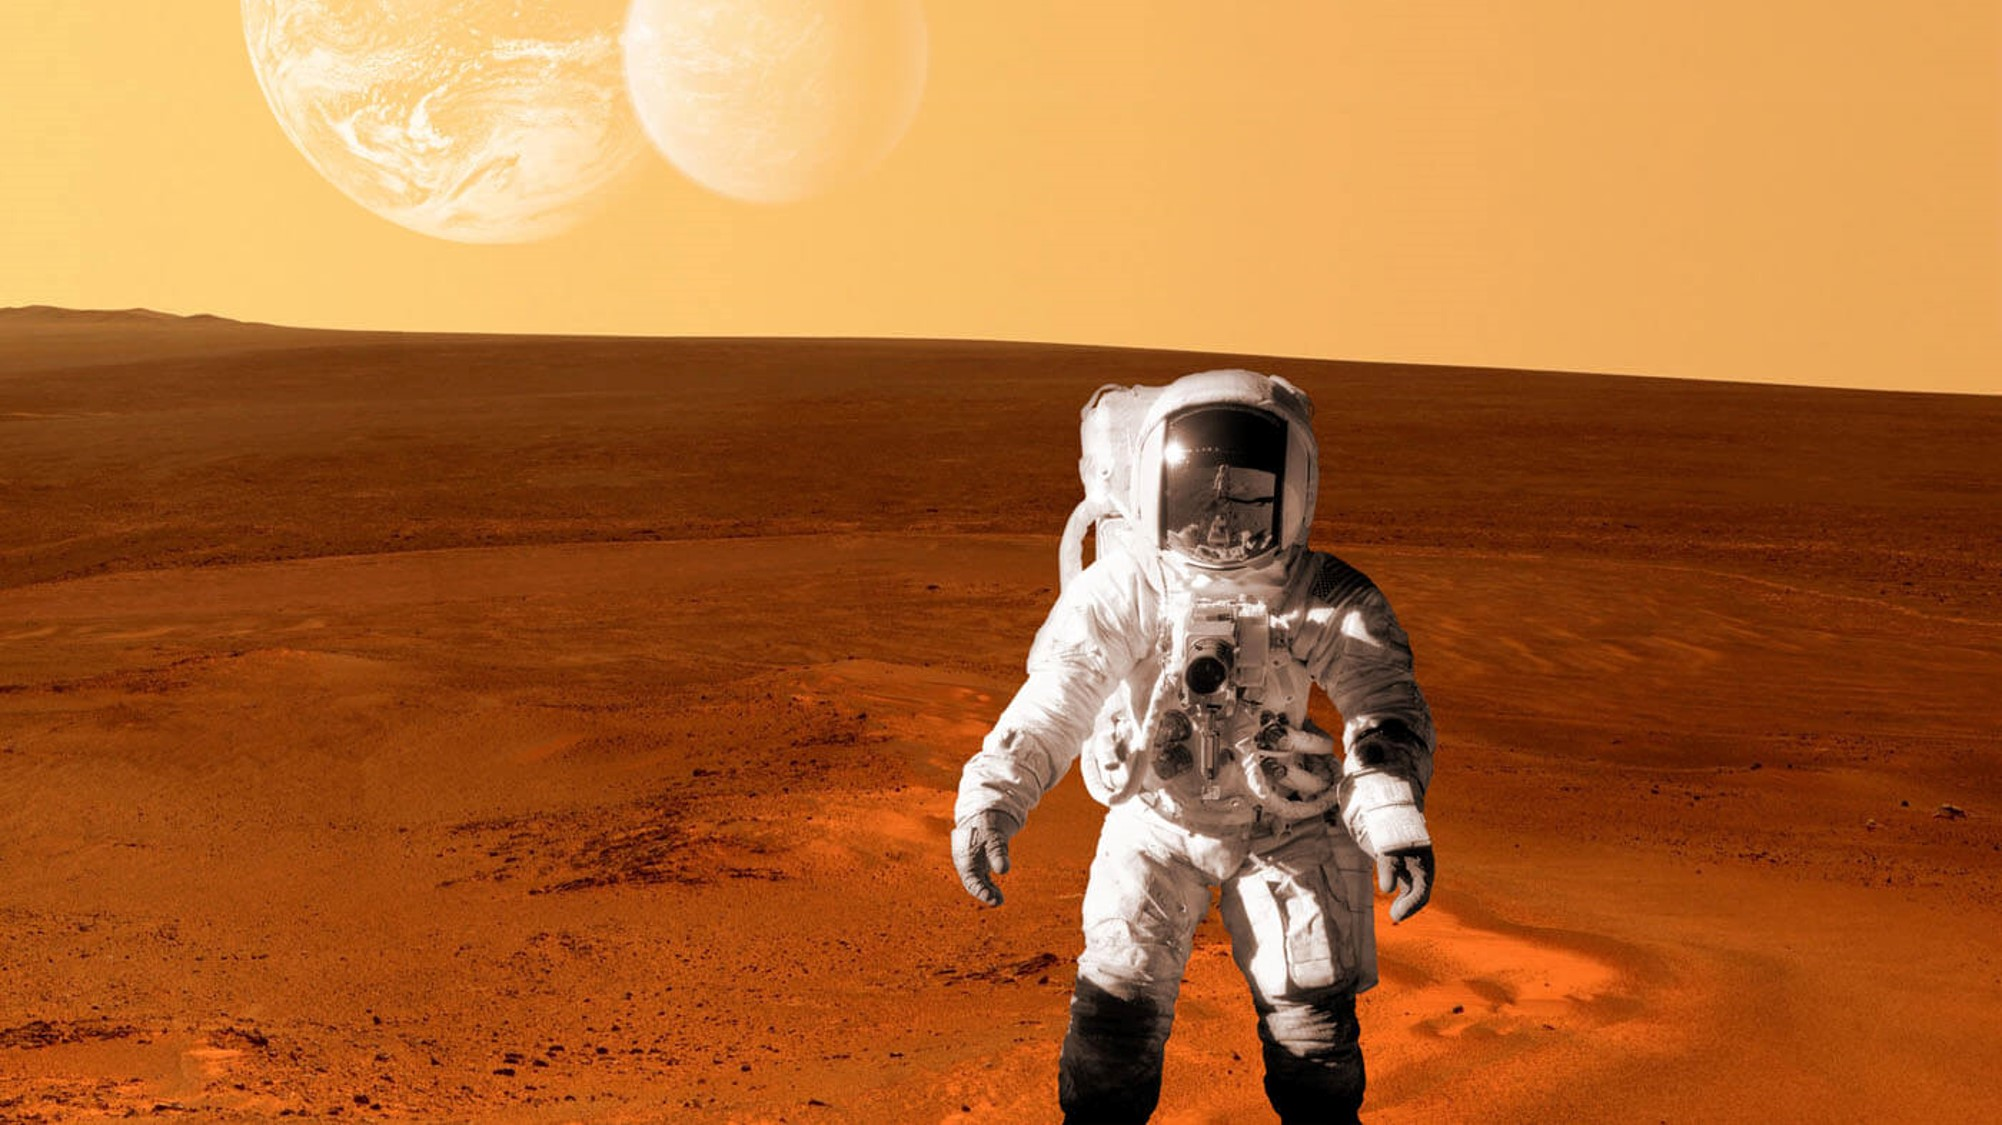 Mission to Mars, virtual team building